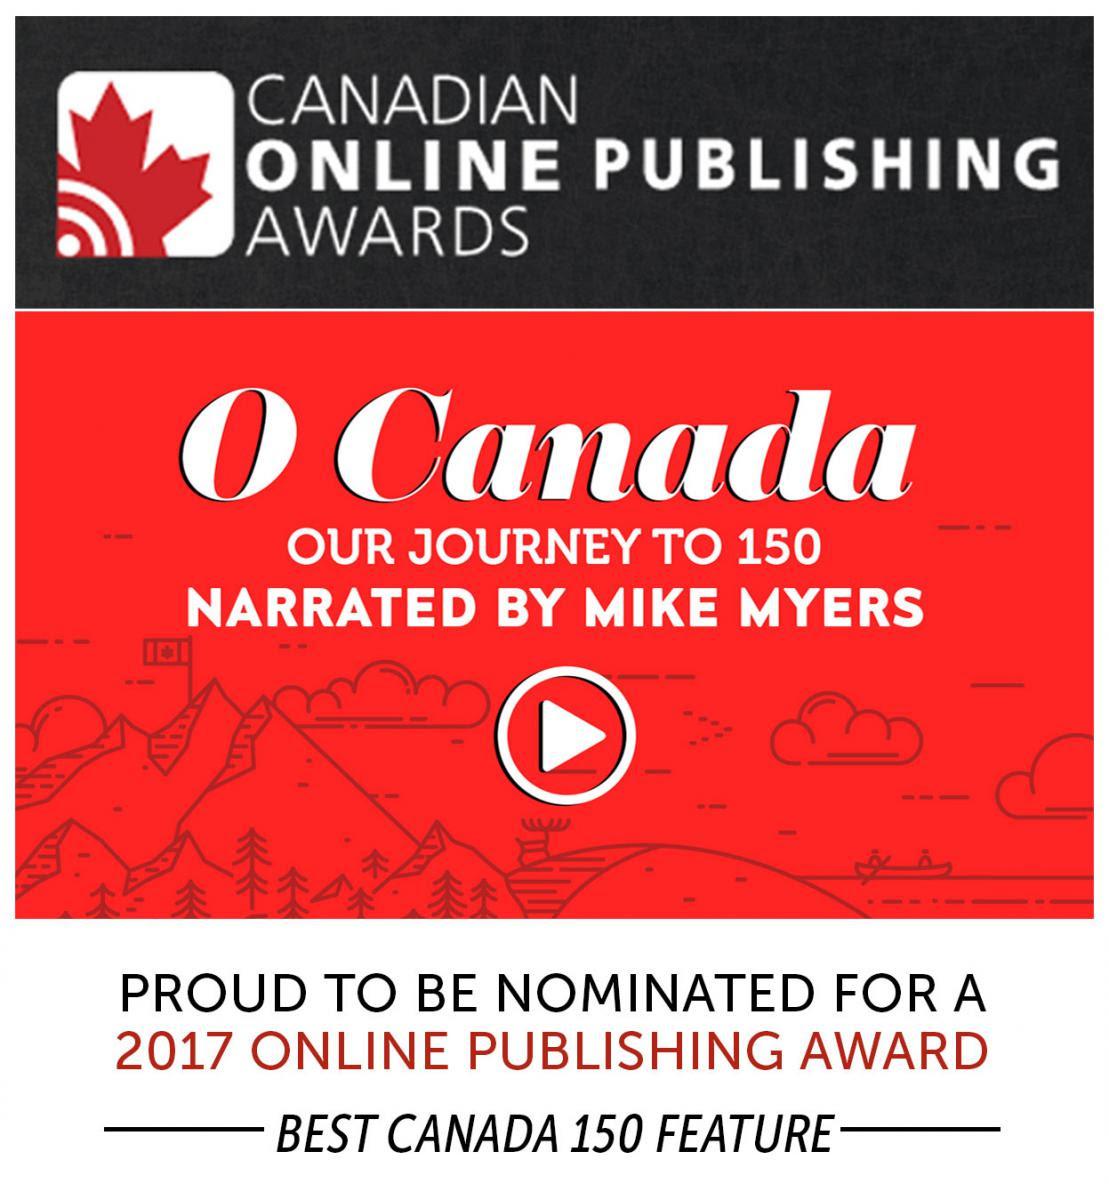 O Canada Video